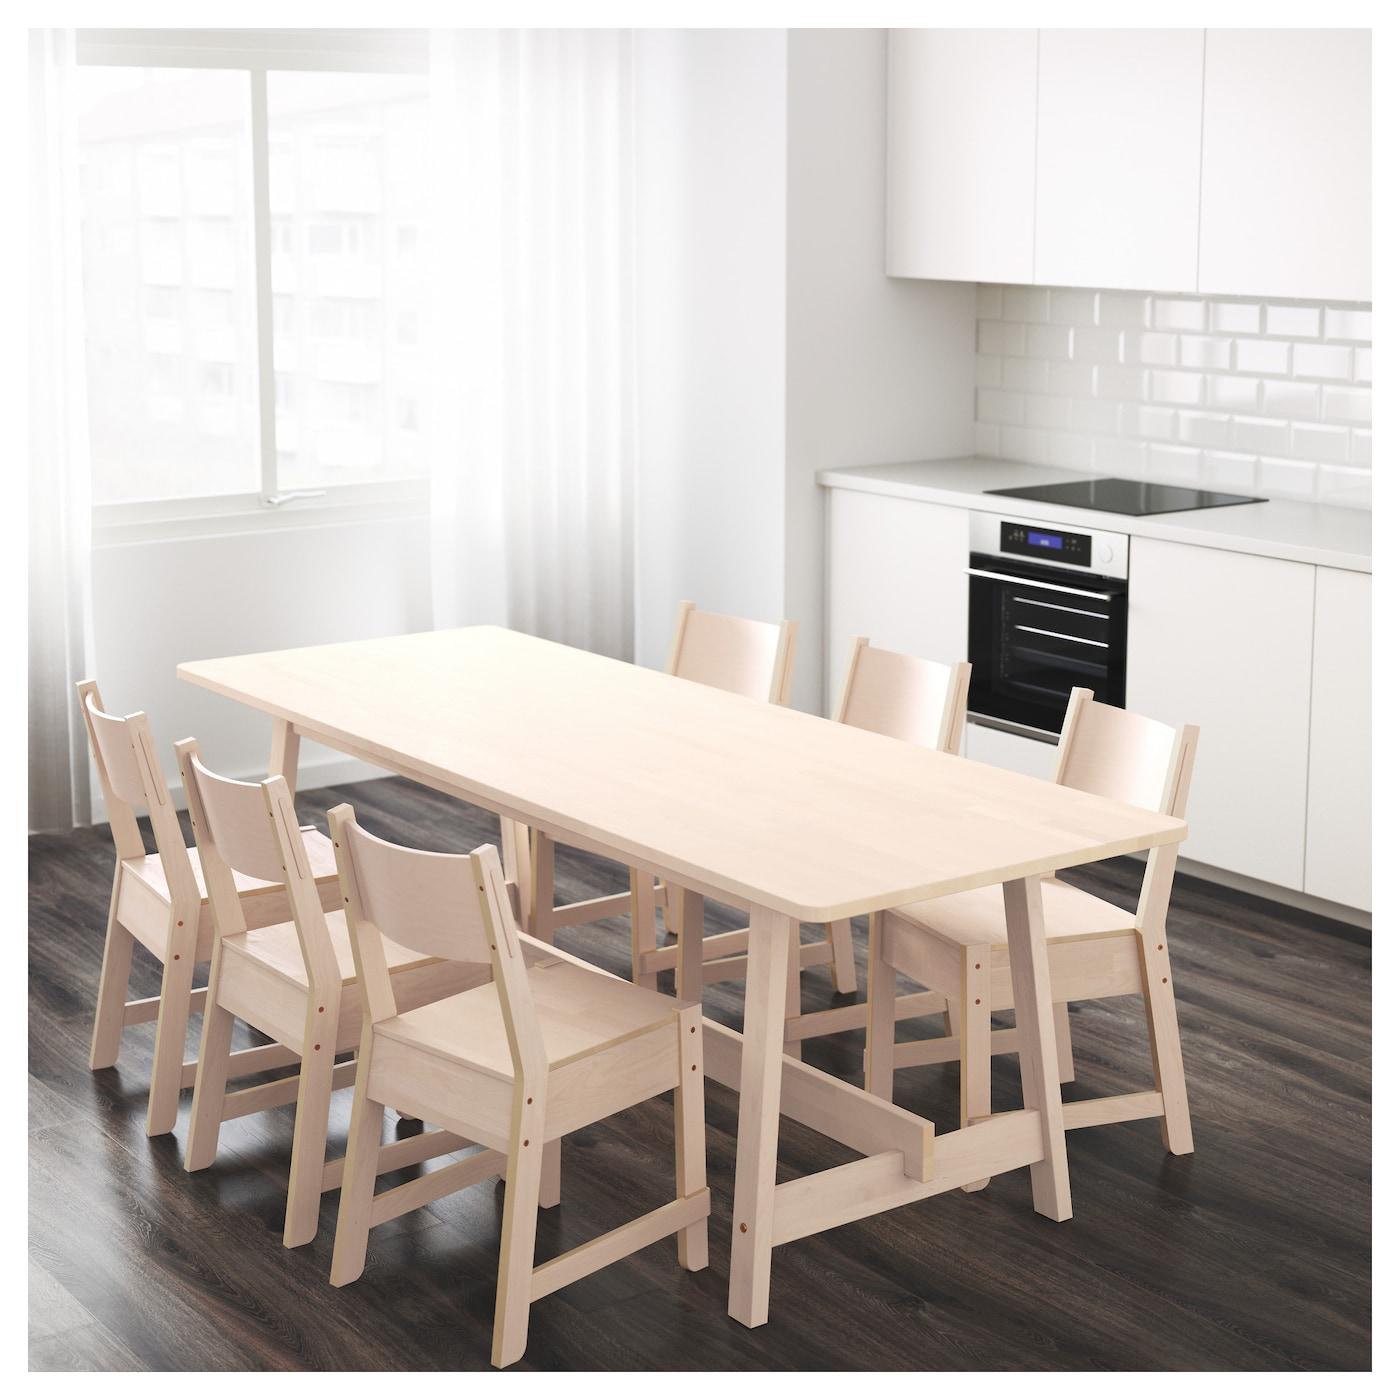 Norr ker table white birch 220x80 cm ikea for Table ikea 5 99